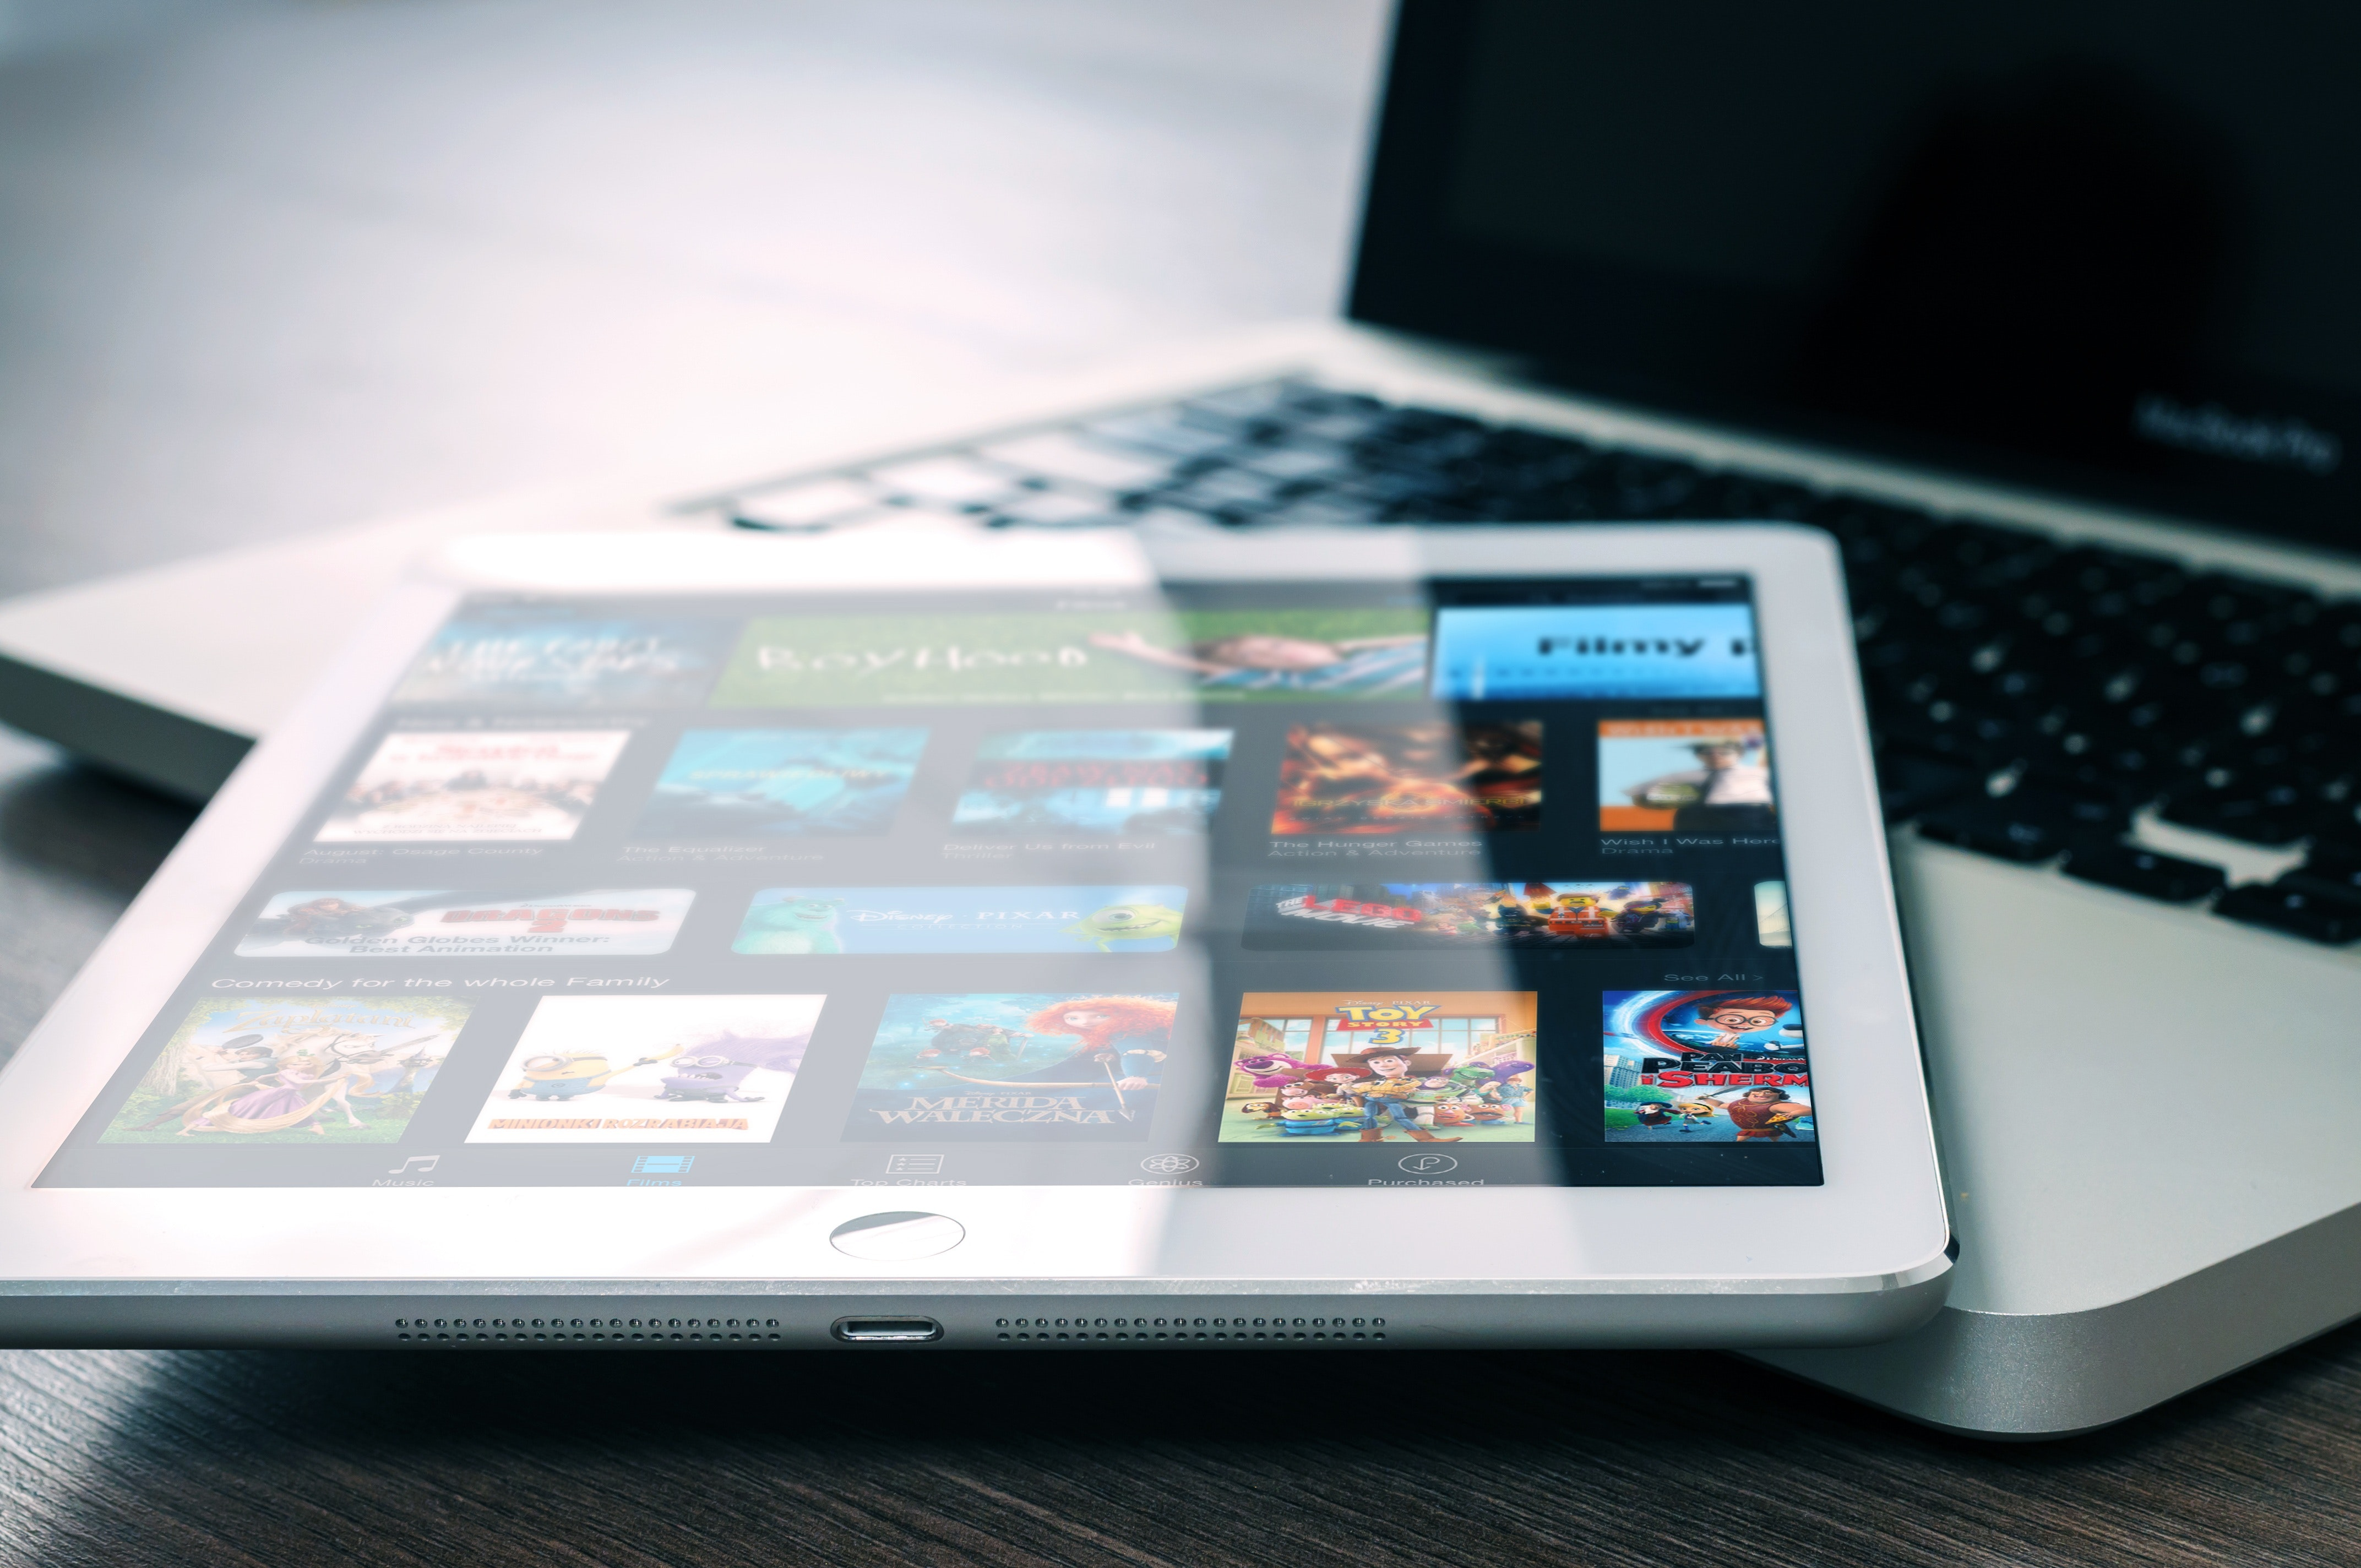 app-entertainment-ipad-265685.jpg